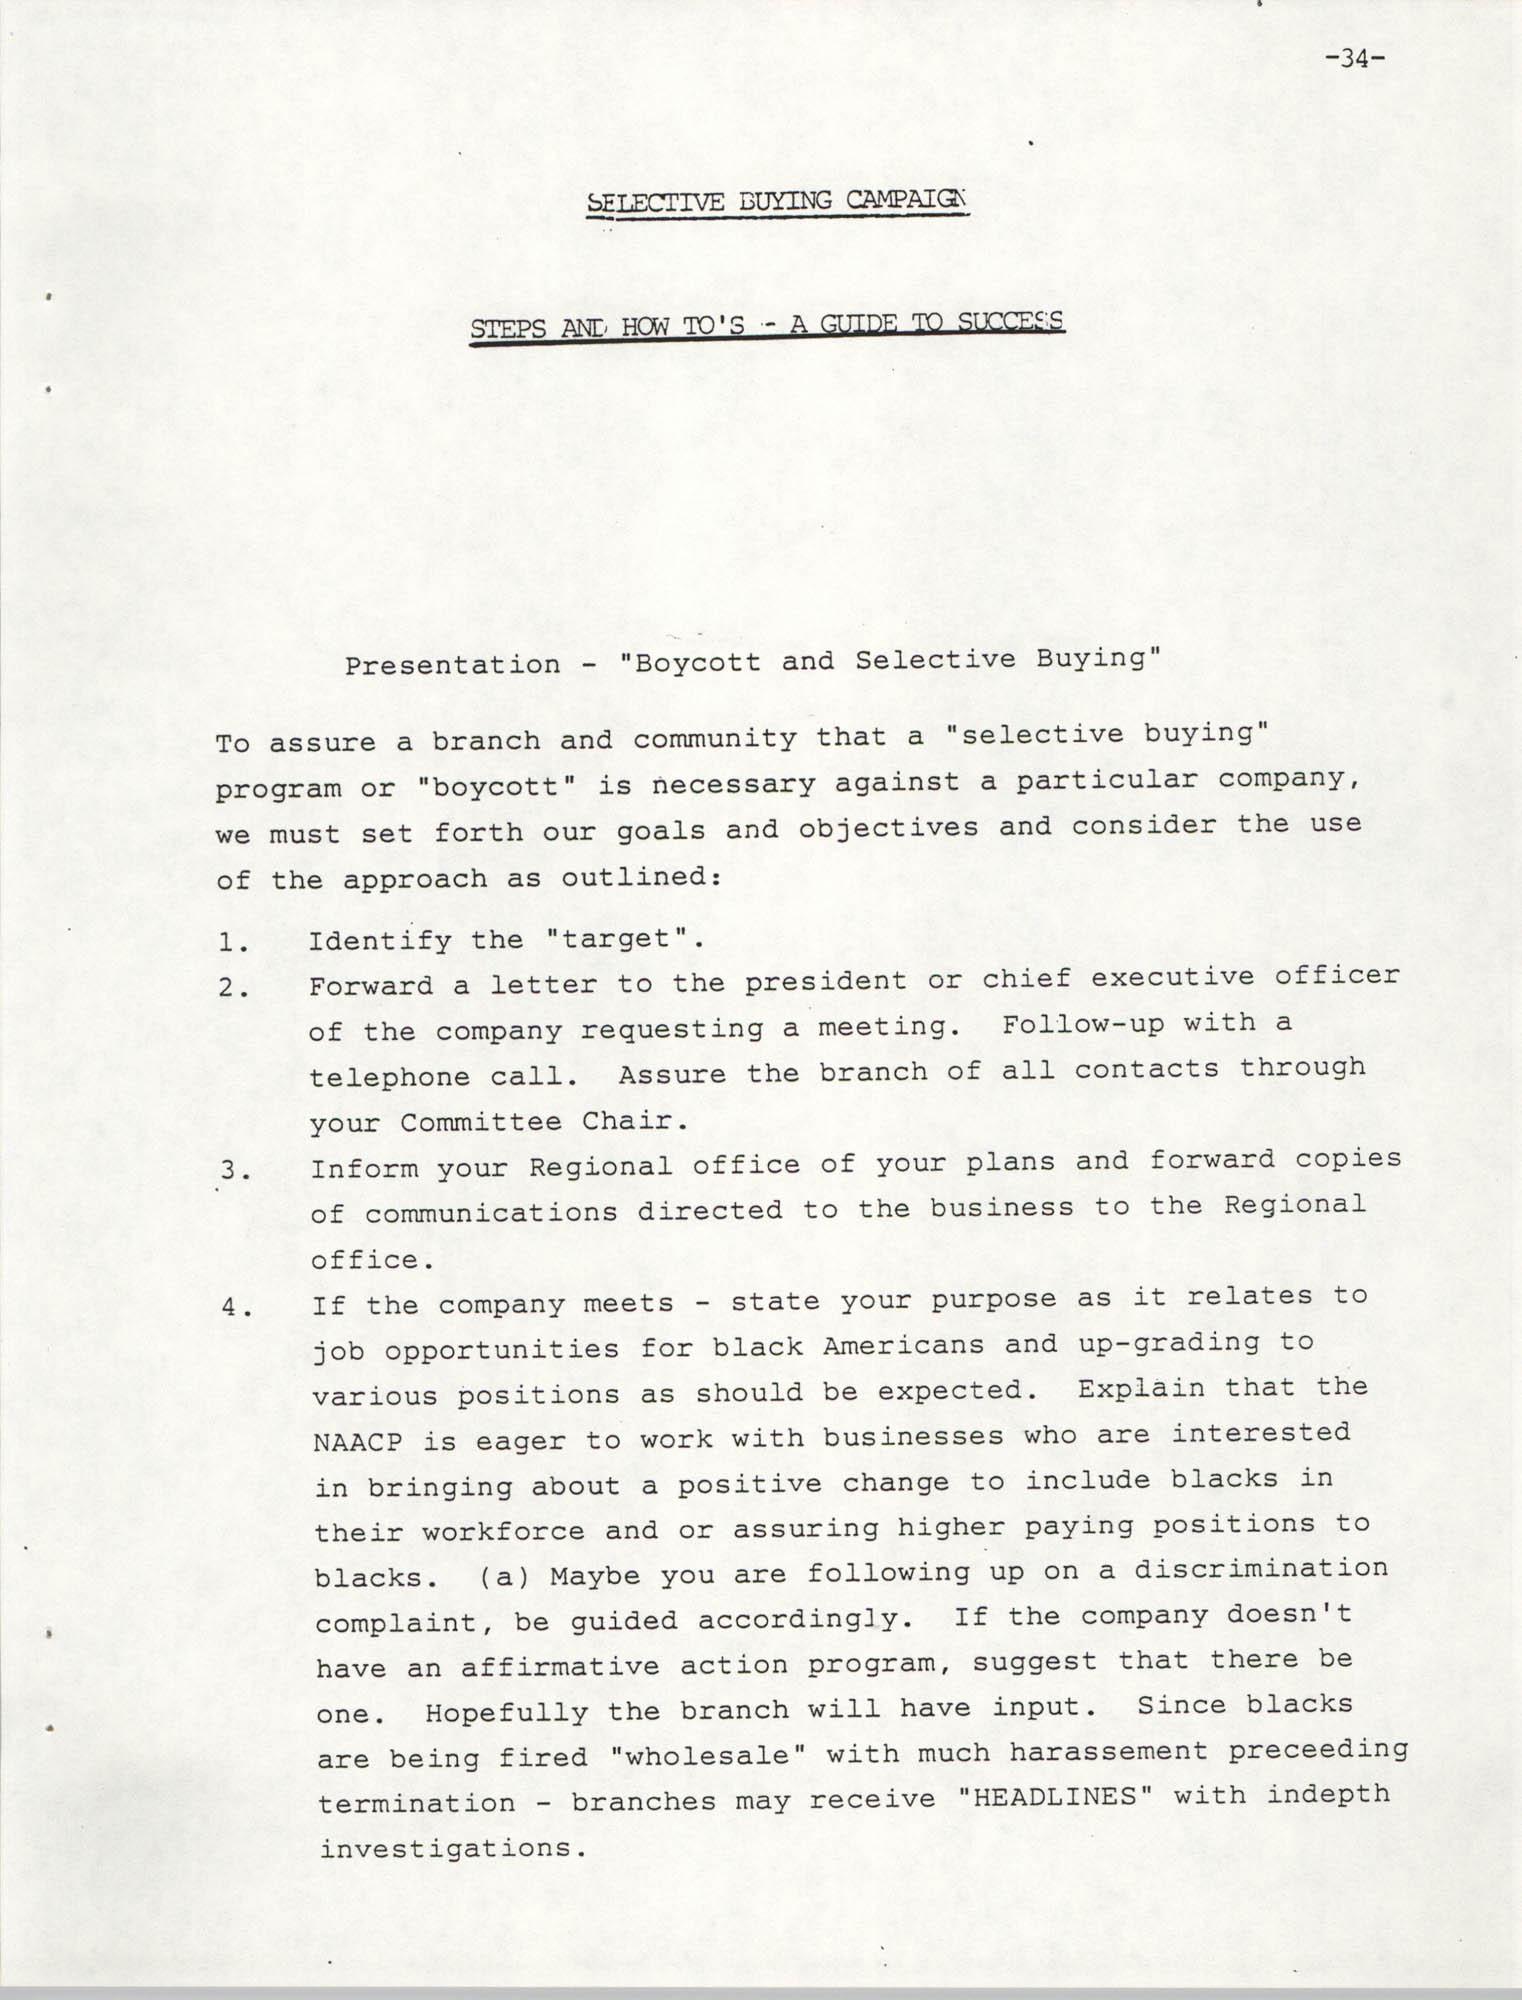 NAACP Mandatory Training Handbook, 1989, Page 34